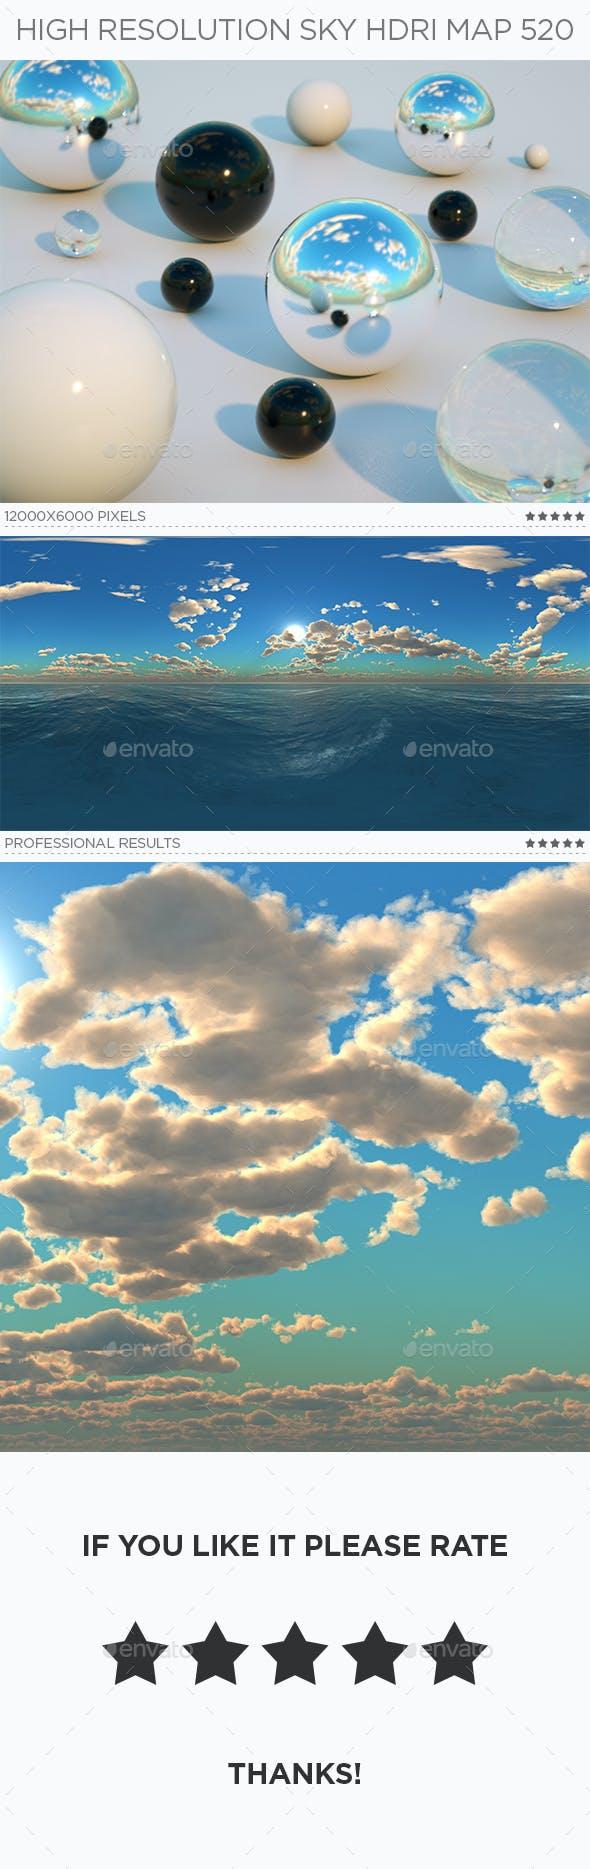 High Resolution Sky HDRi Map 520 - 3DOcean Item for Sale